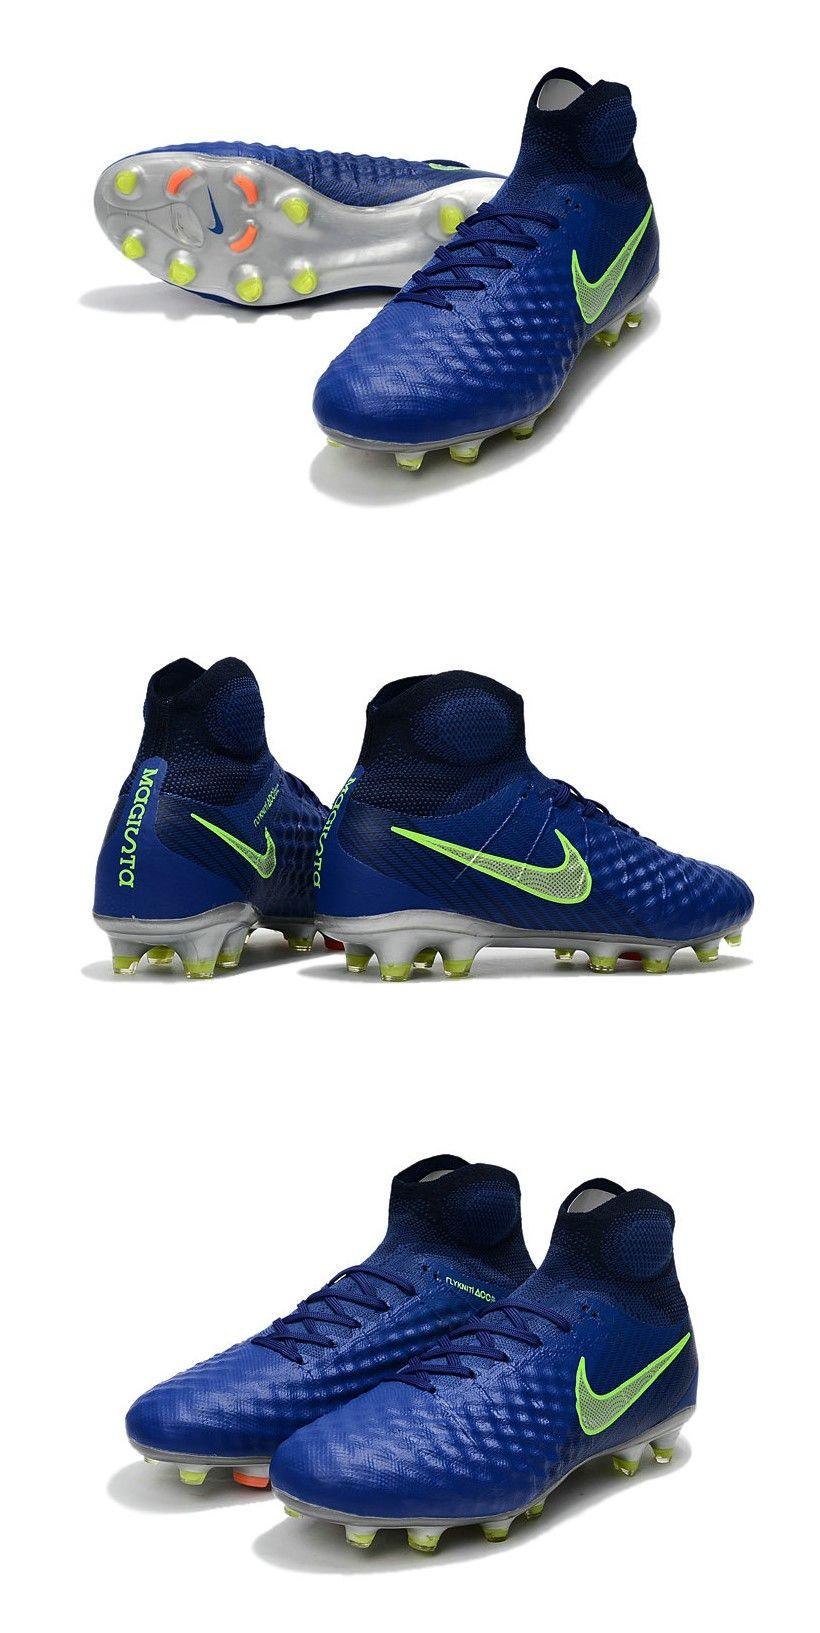 cheaper 1a3ca 95ac5 Crampons Football Nouvel Nike Magista Obra 2 FG Bleu Jaune ...